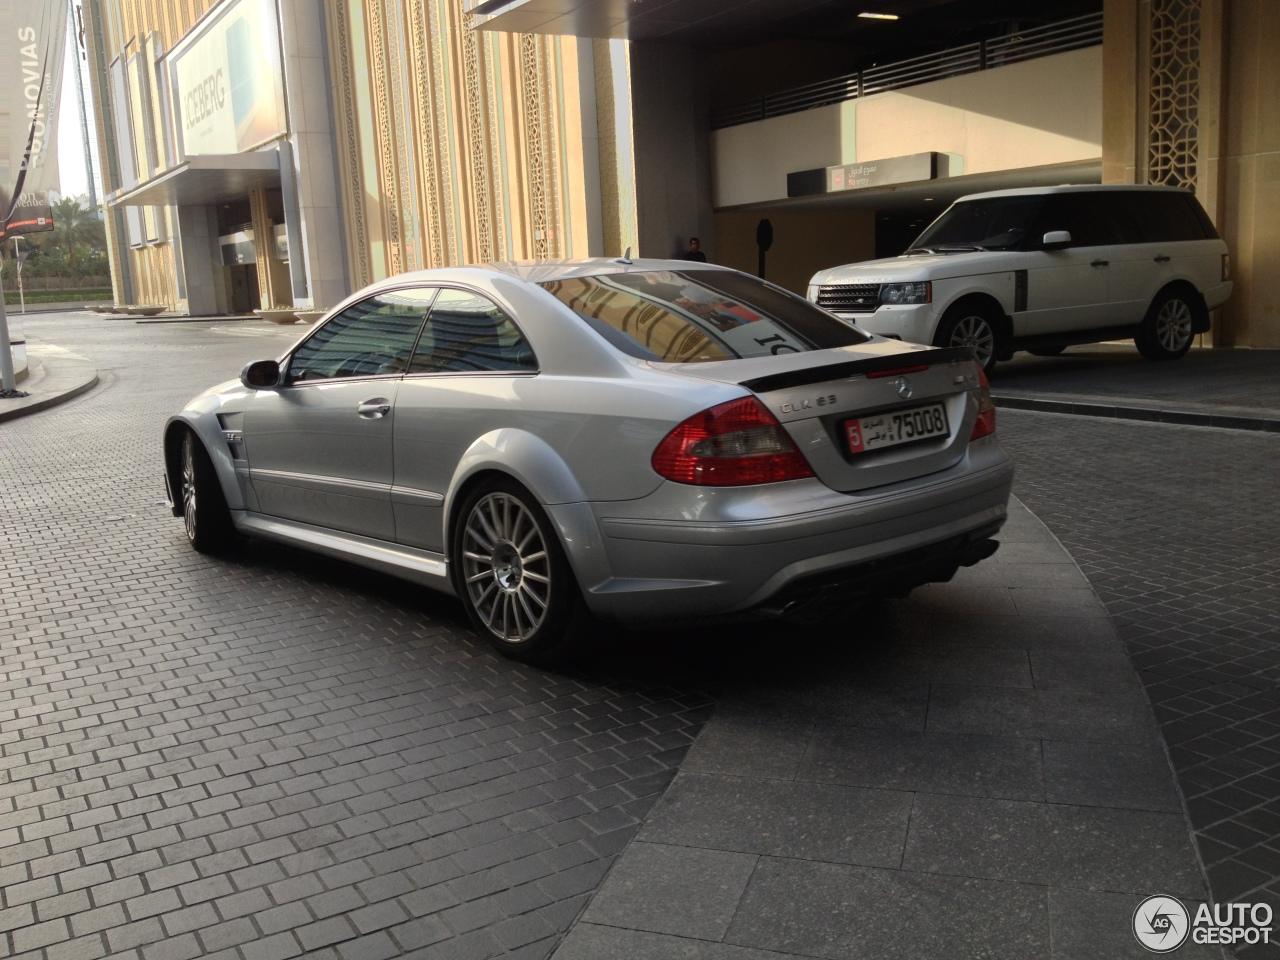 Mercedes benz clk 63 amg black series 3 dcembre 2015 for Mercedes benz 3 series